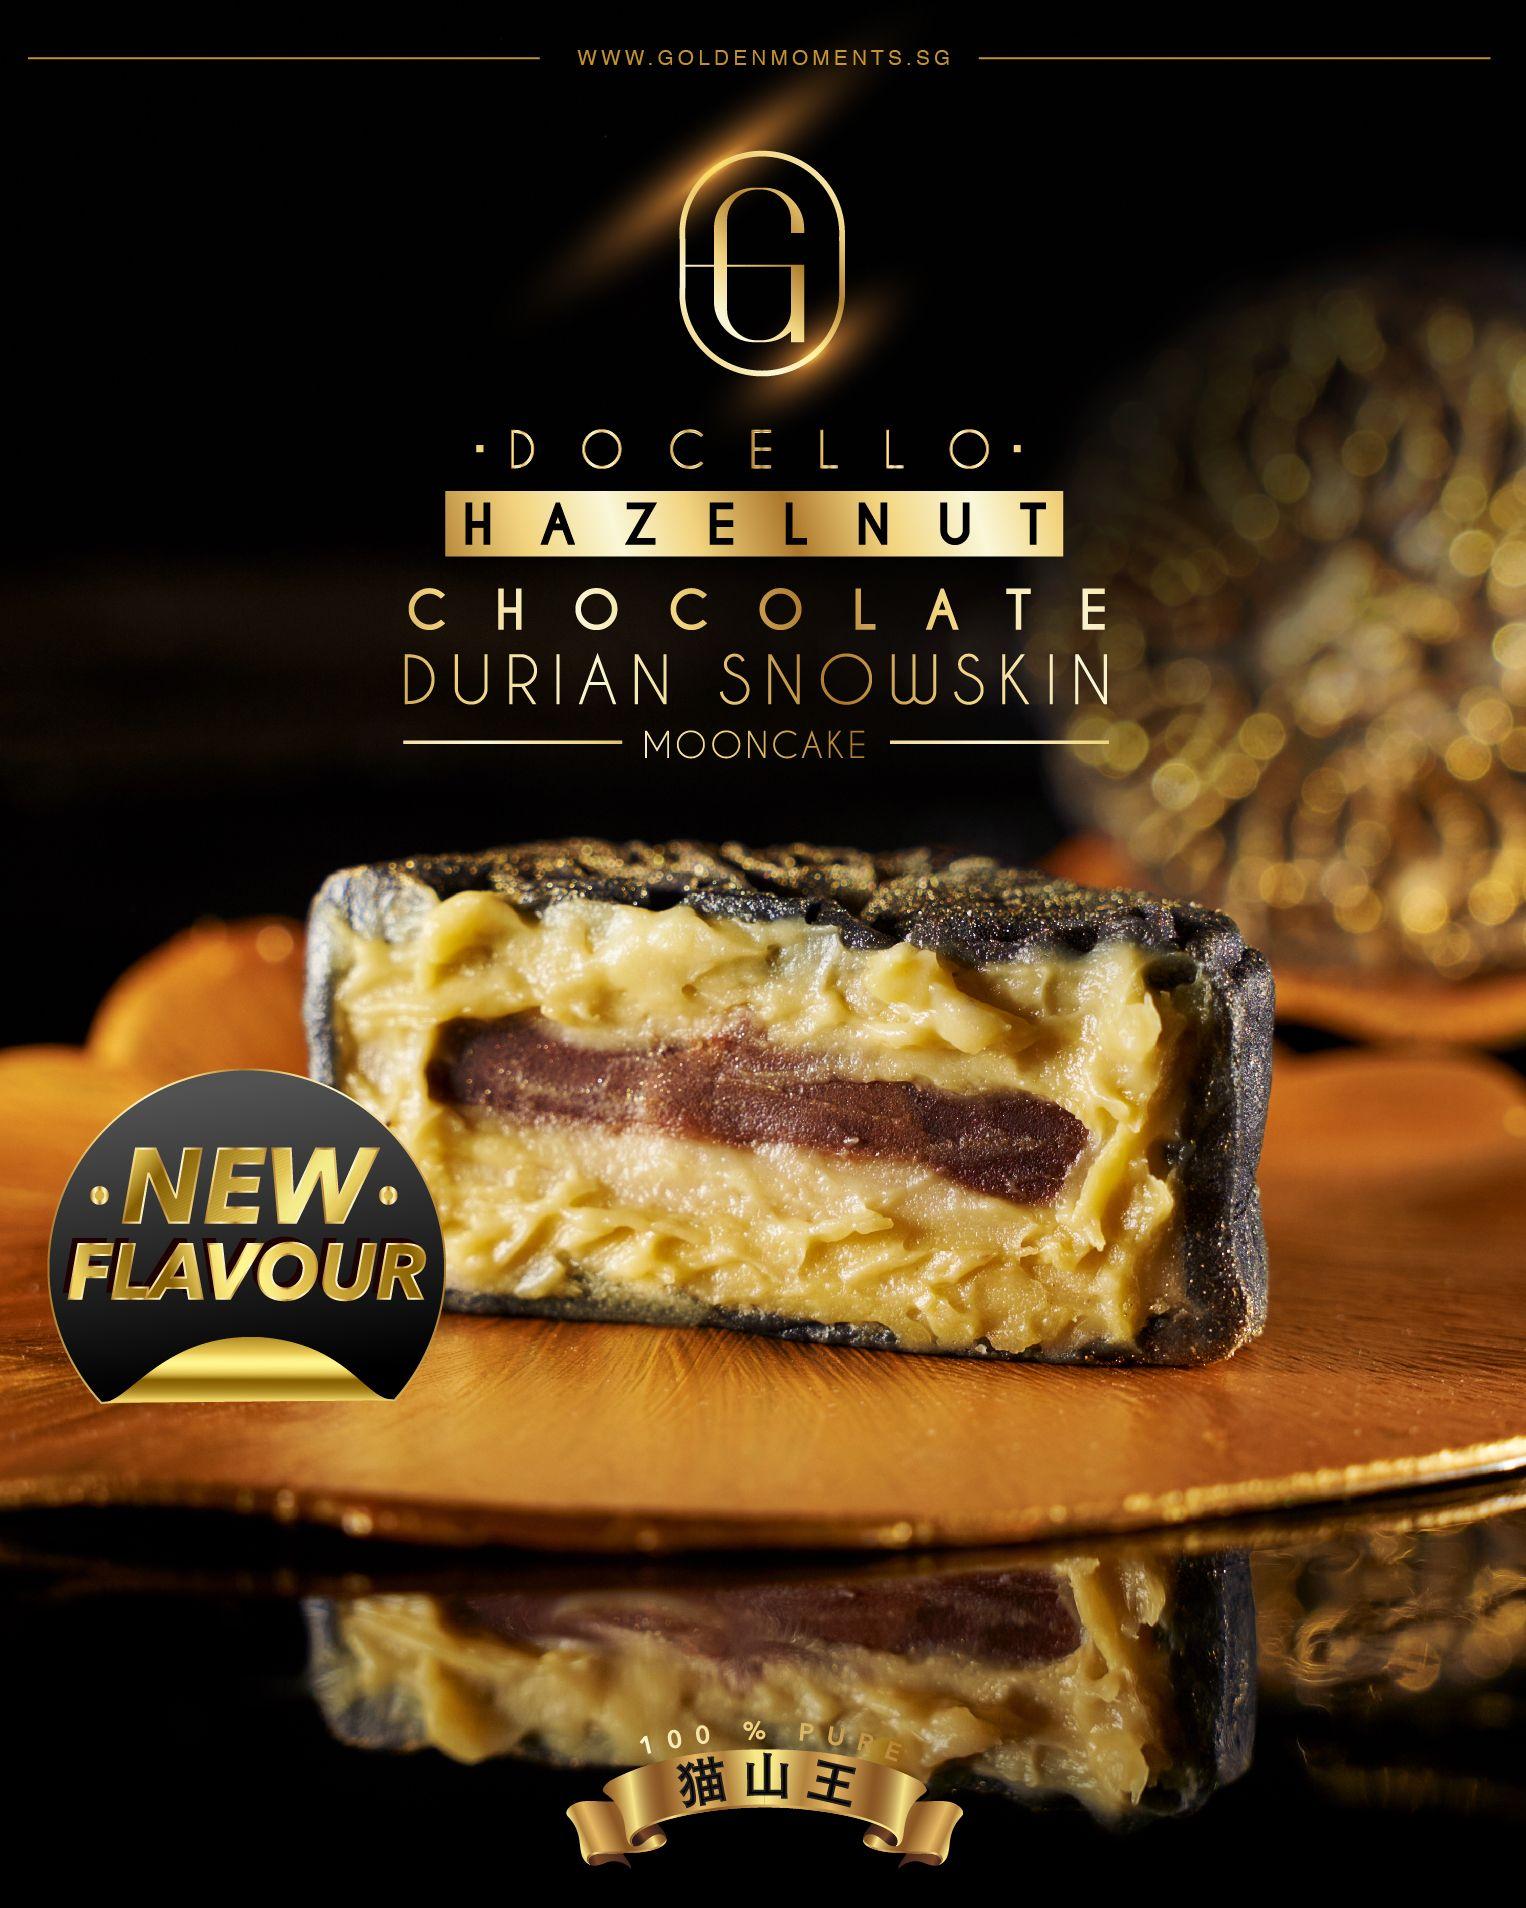 [1 FOR 1] Docello Hazelnut Chocolate Mao Shan Wang Snowskin Mooncake (Box of 4) !!*EXTENDED PROMO*!!